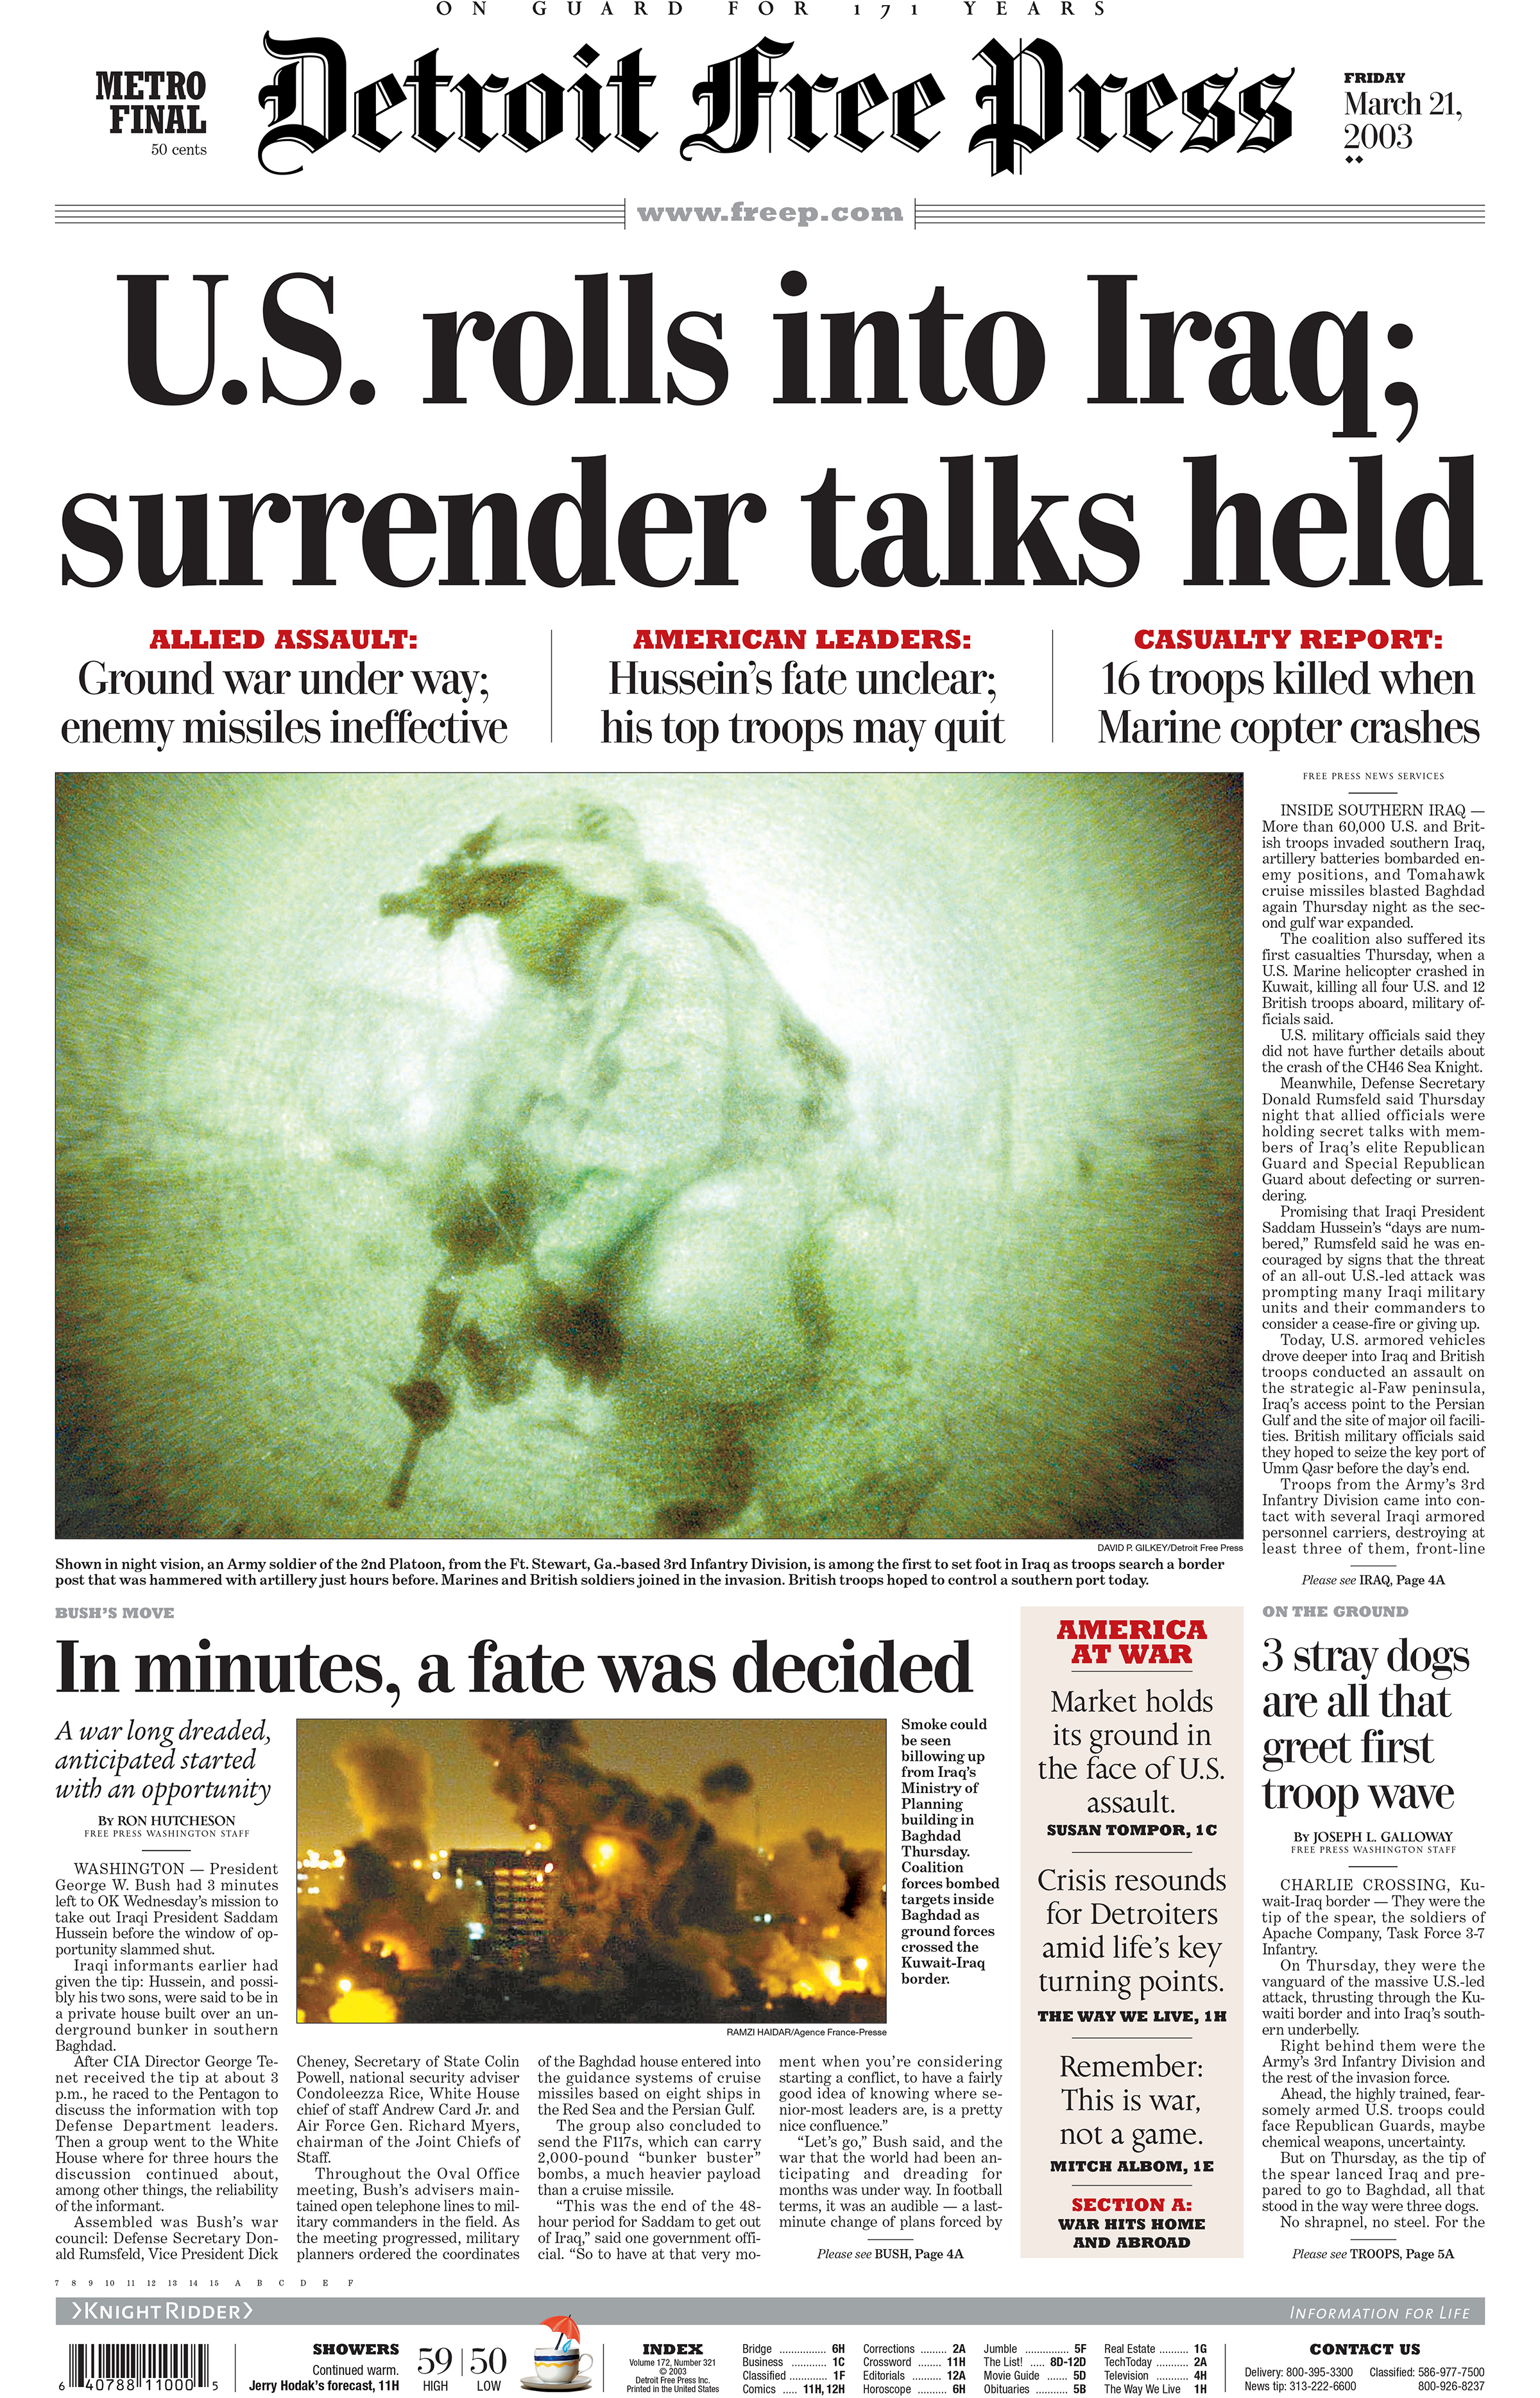 The Detroit Free Press